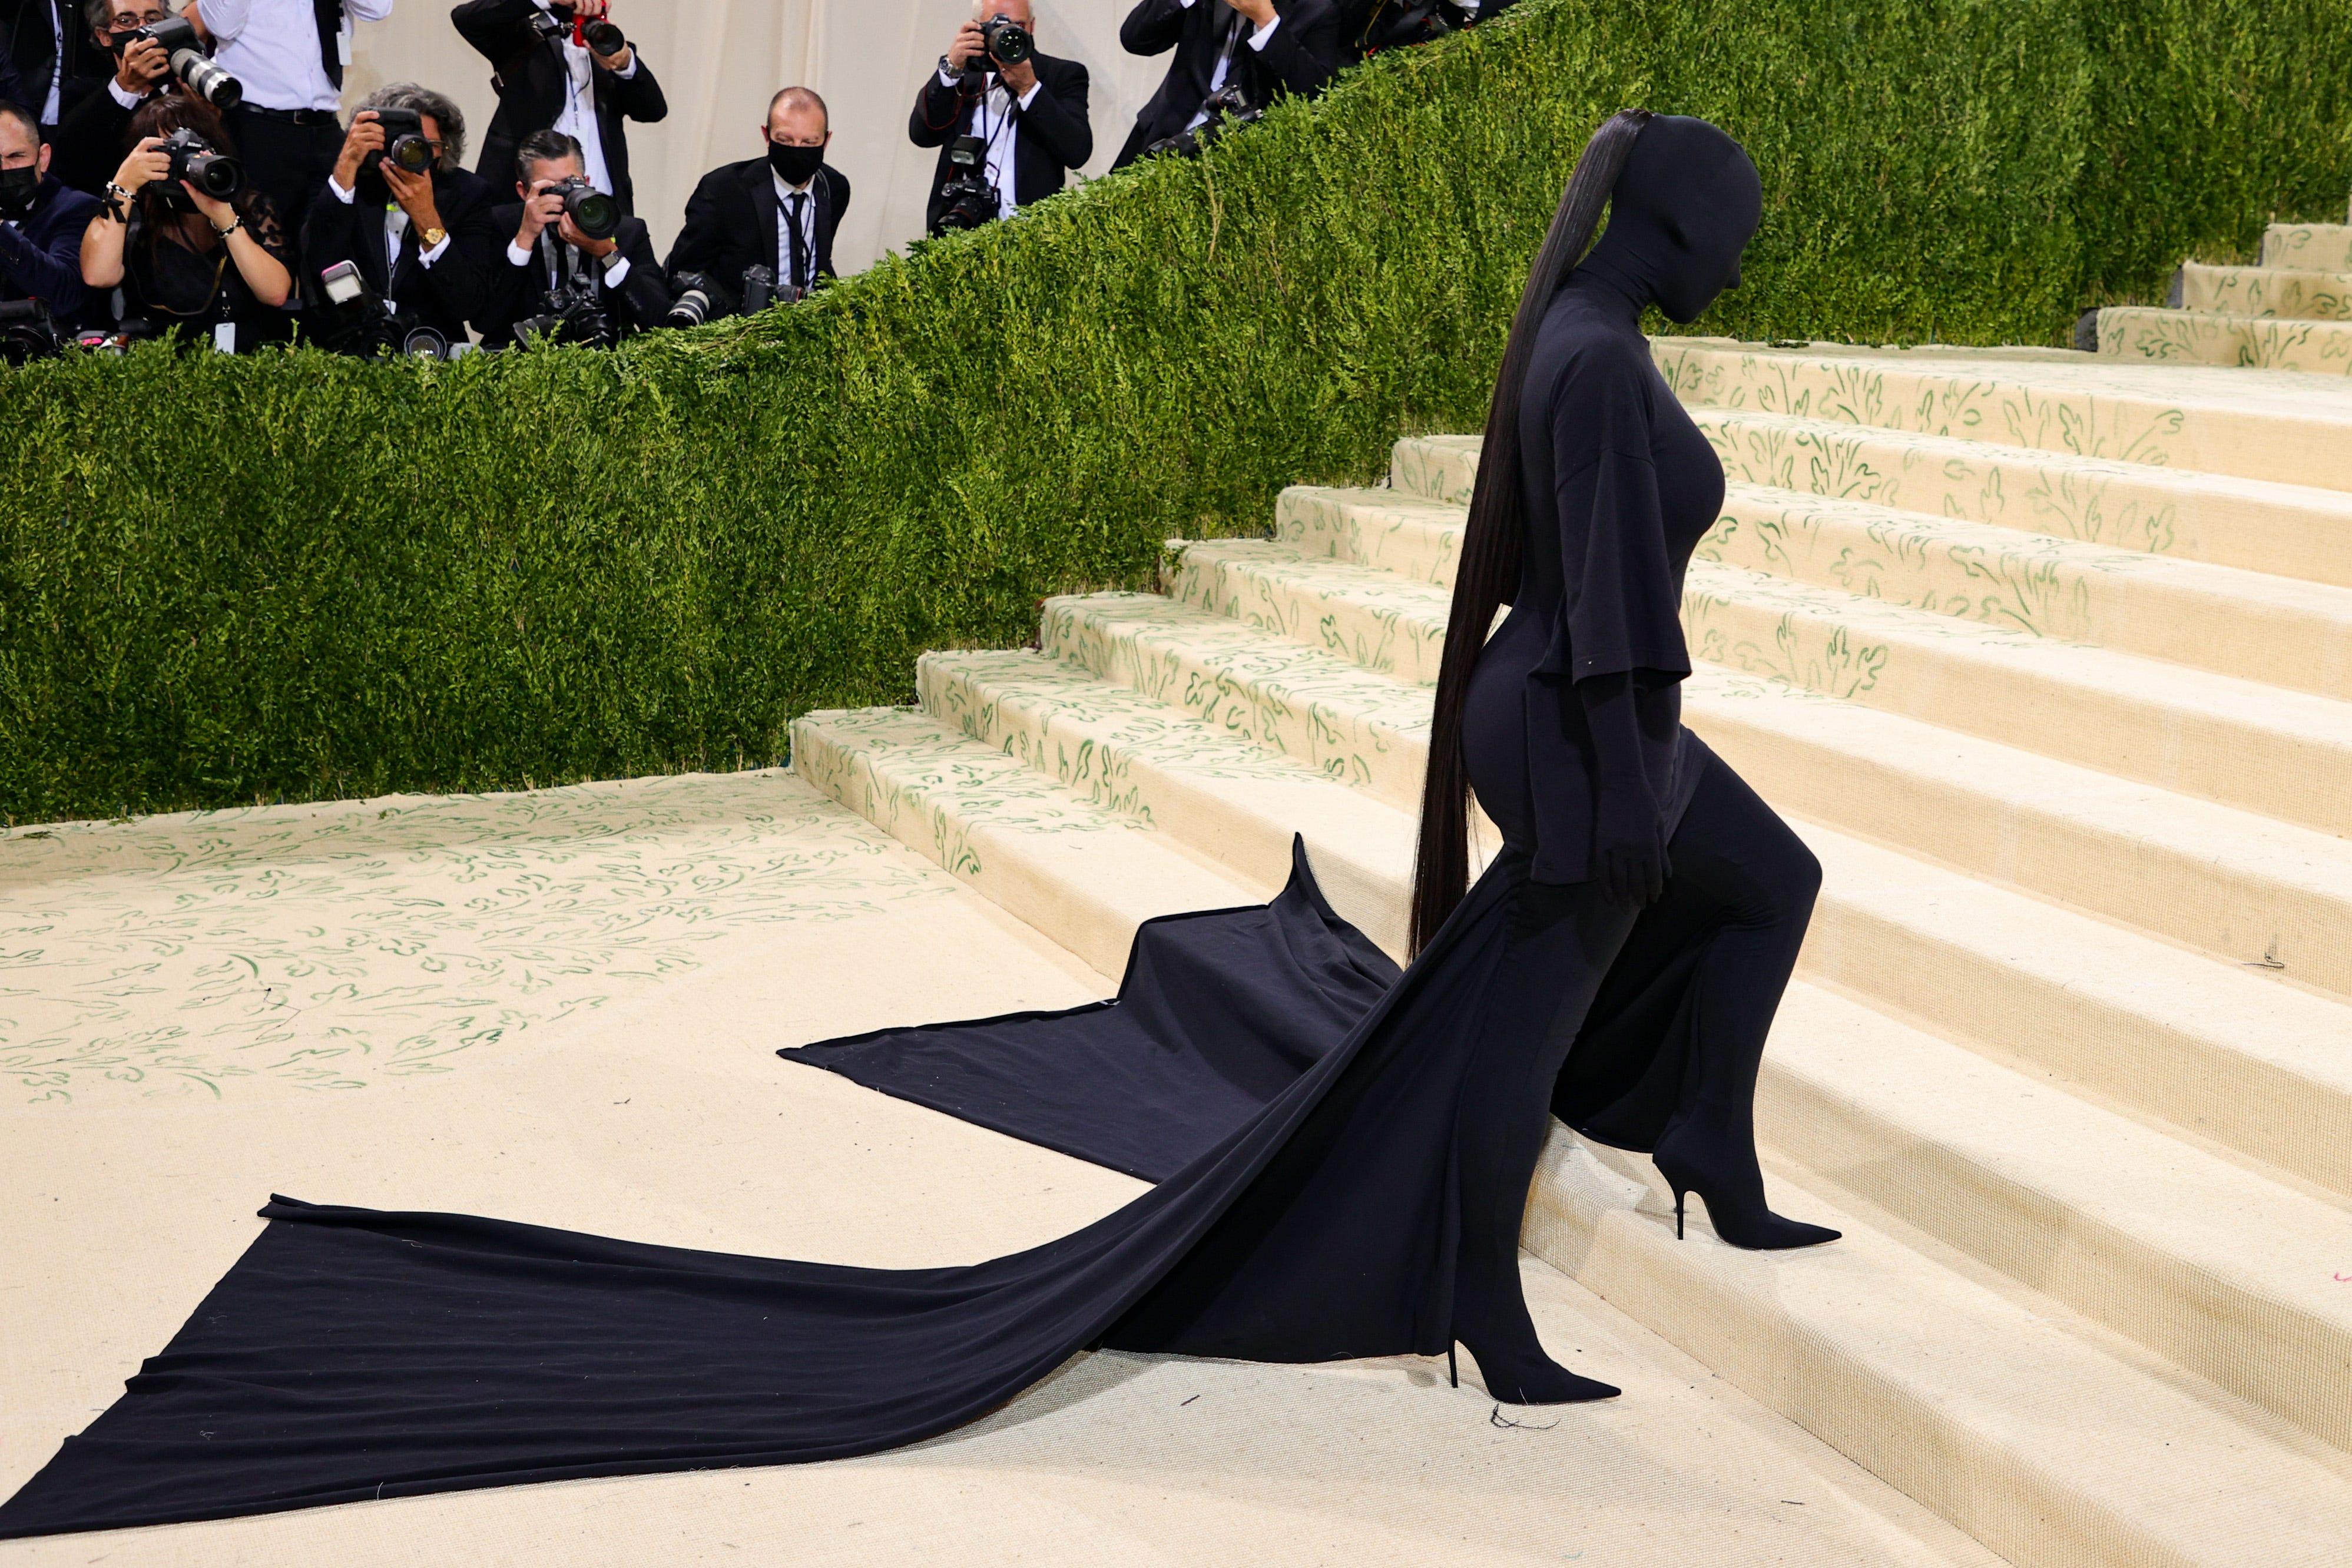 Kim Kardashian walks up the steps covered in black fabric.